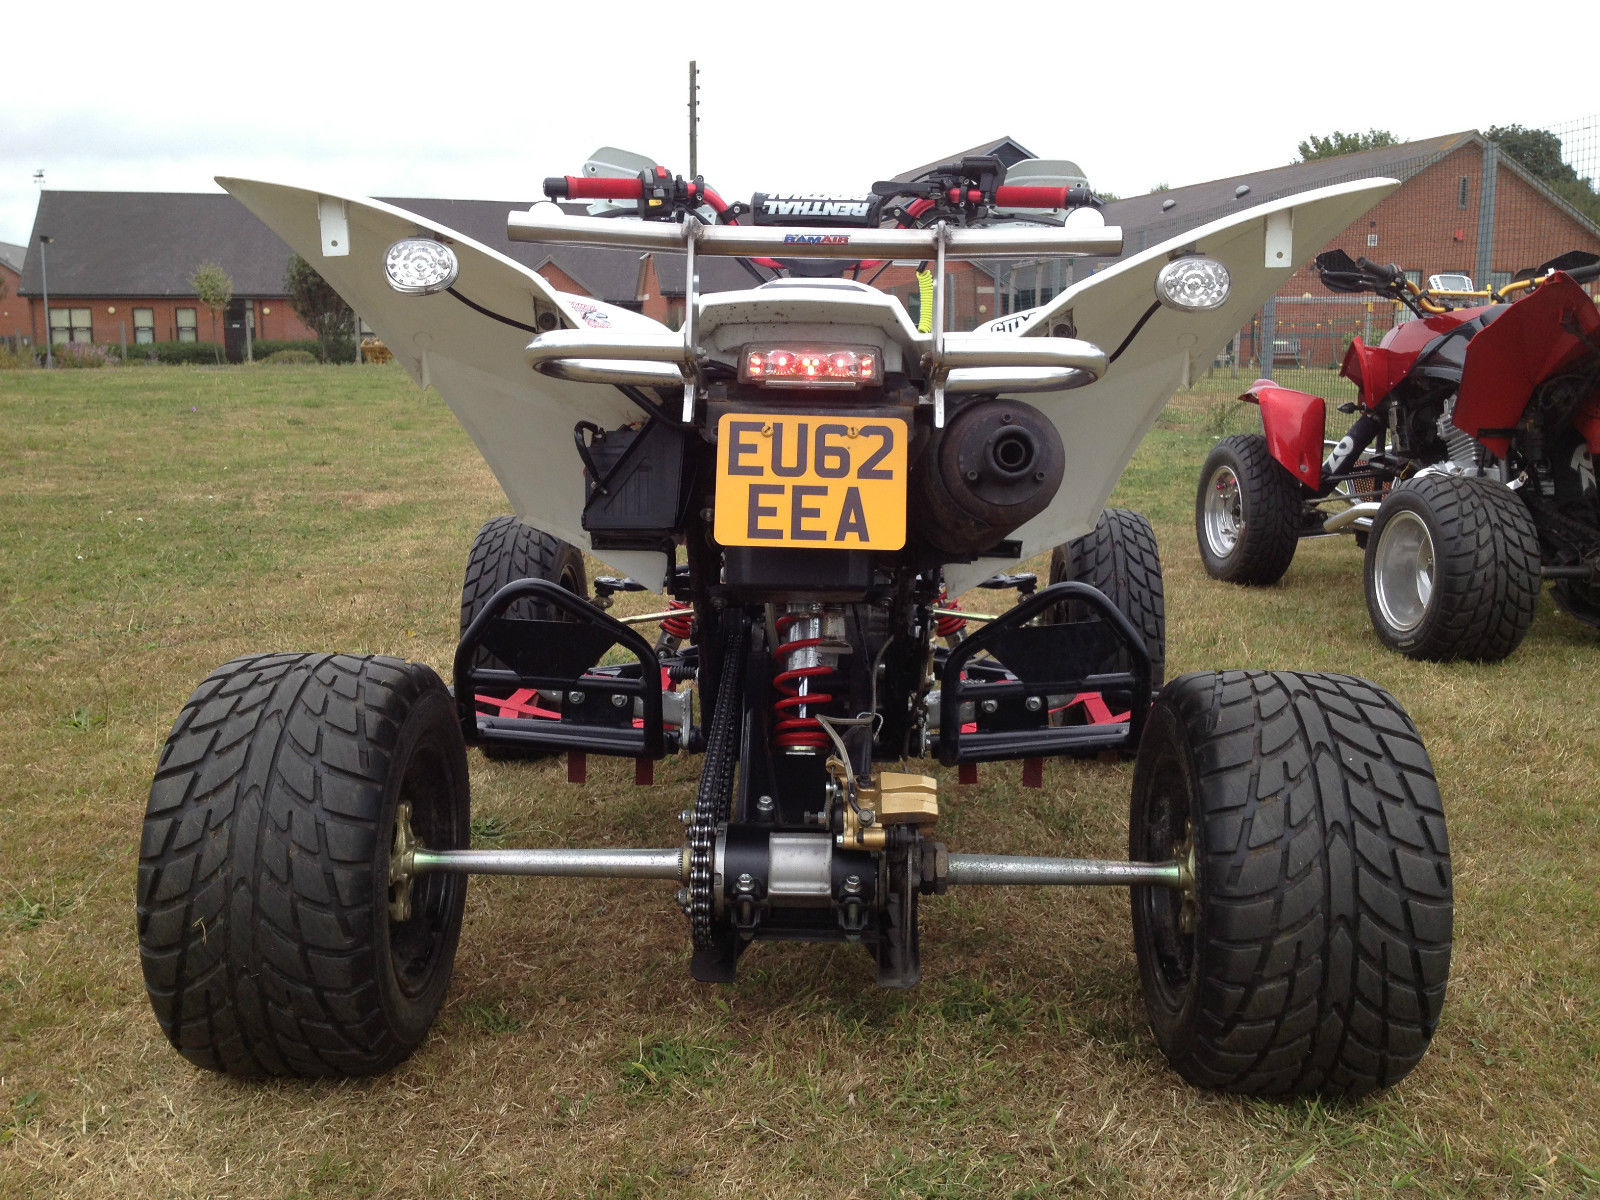 Set of Aftermarket Alloy Rear Wheel Spacers to fit a Quadzilla 500XLC Quad Bike